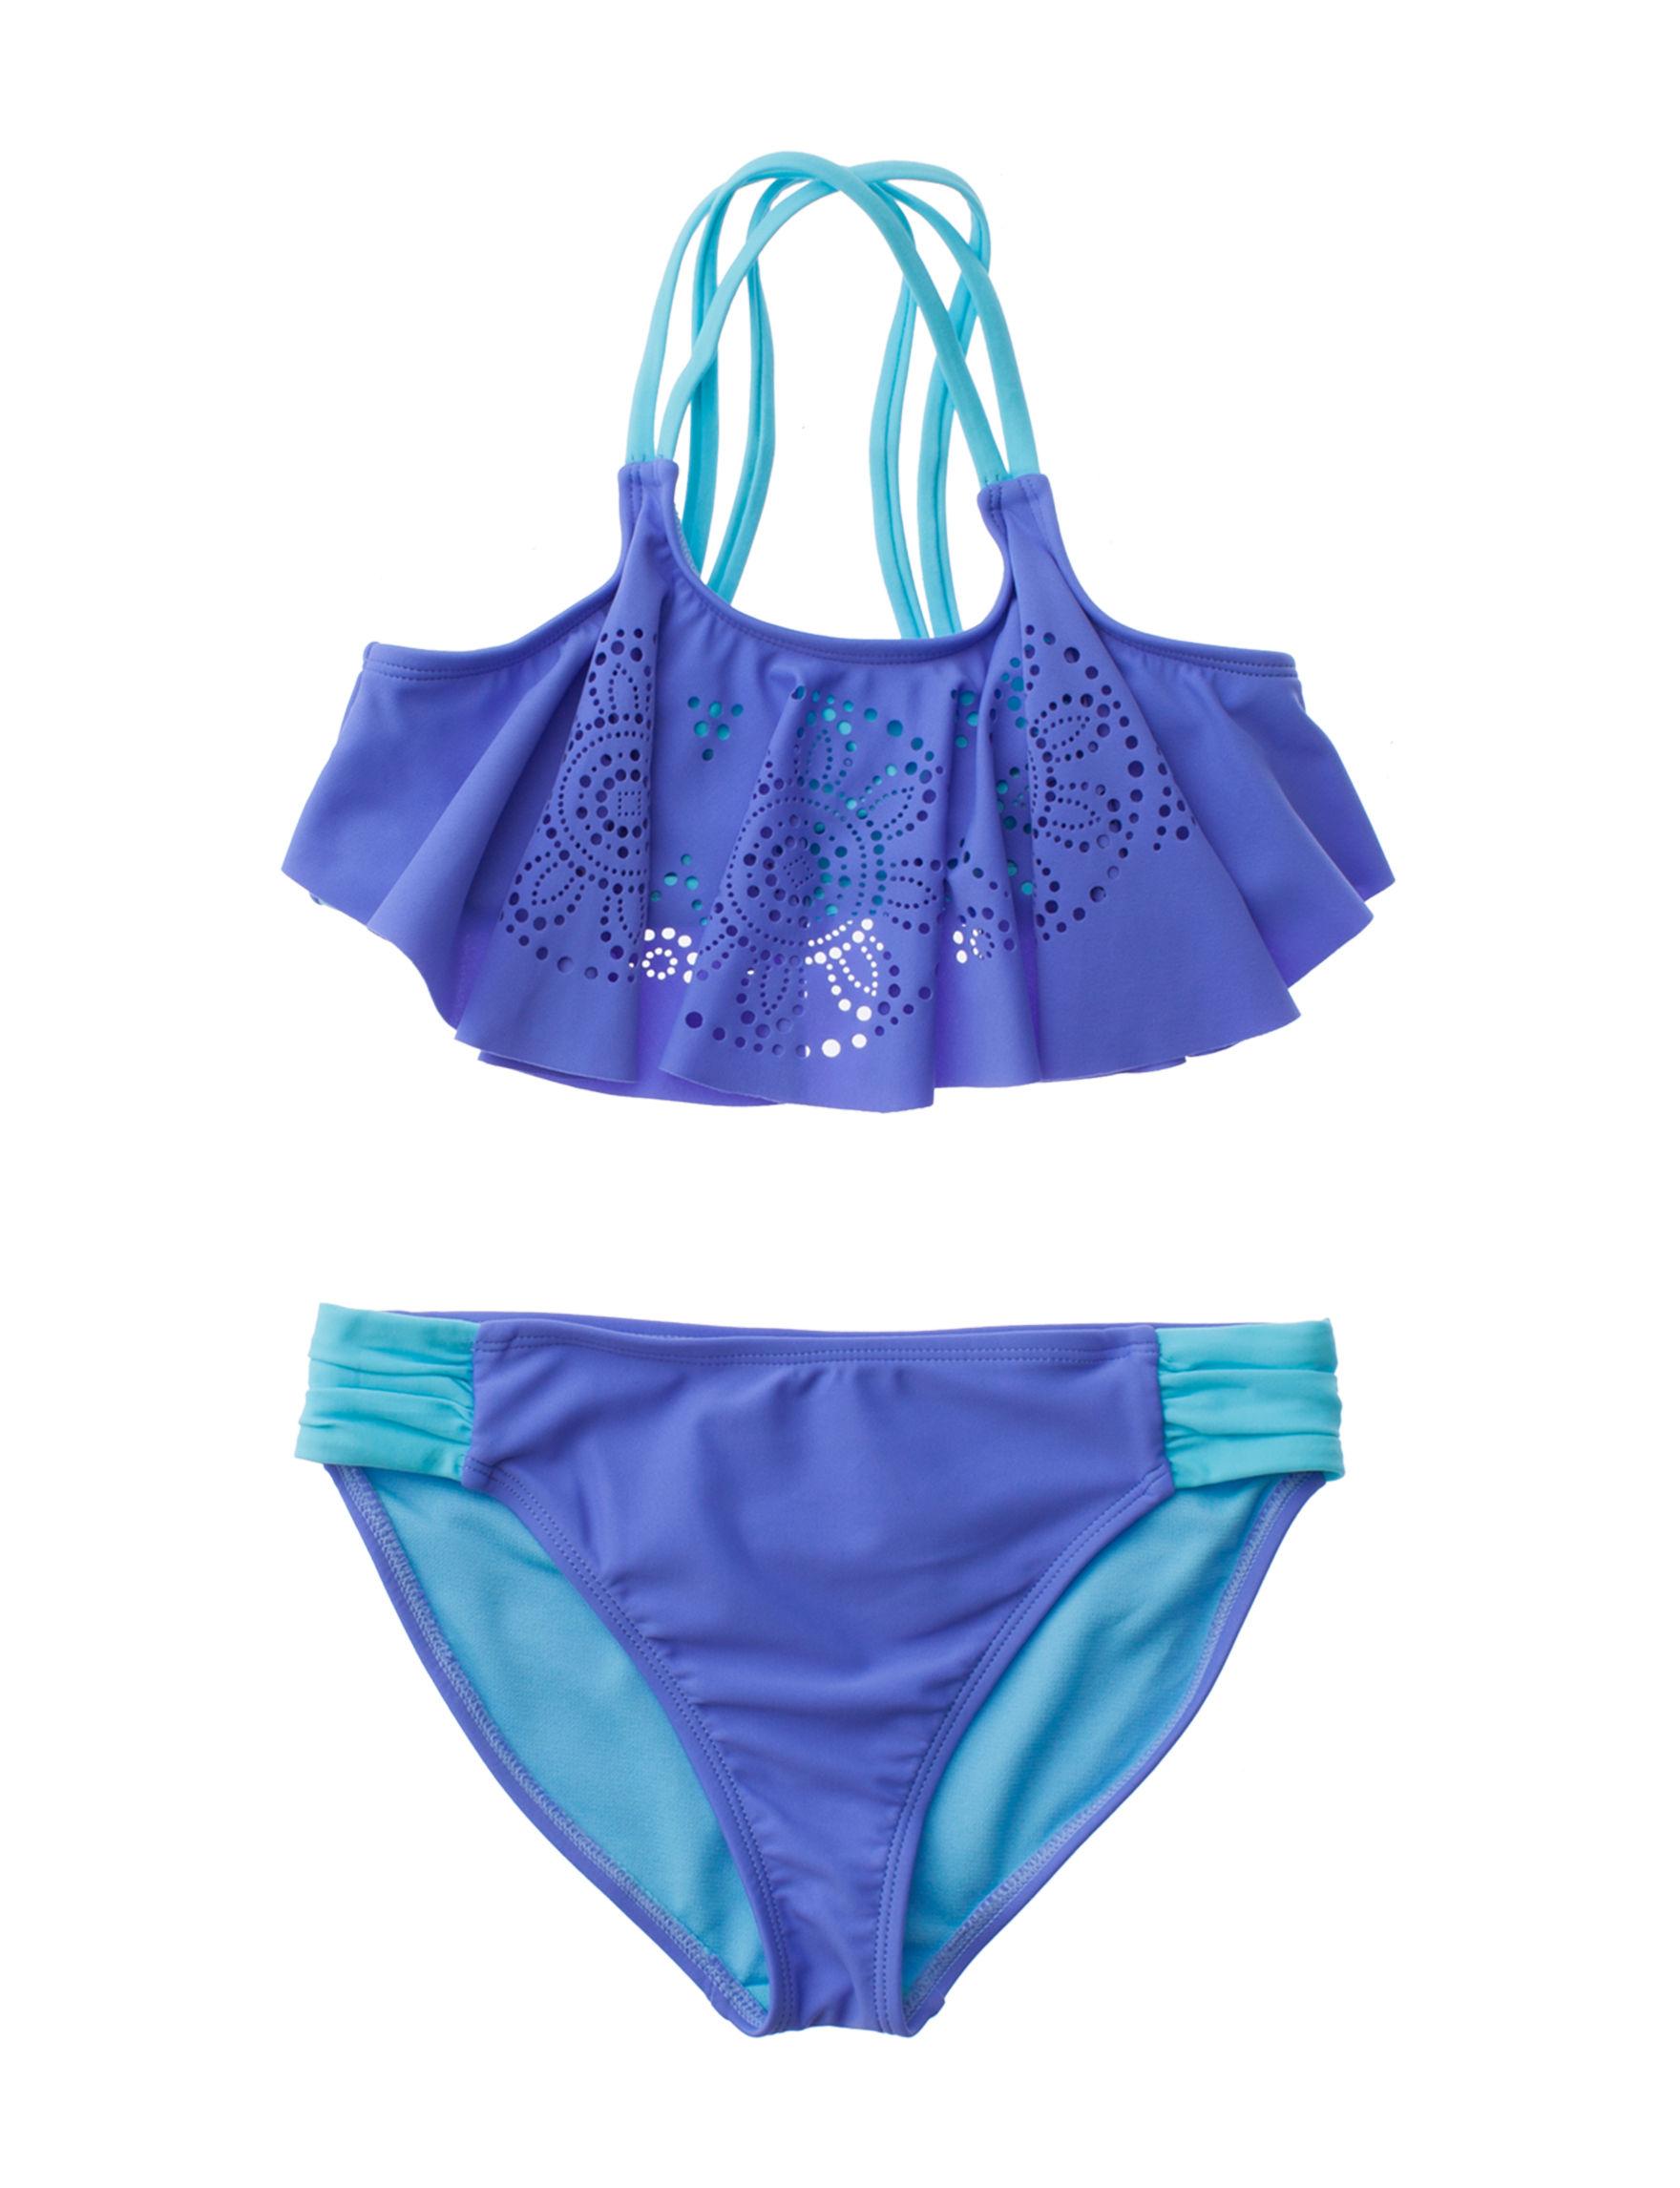 Angel Beach Cobalt Blue Swimsuit Sets